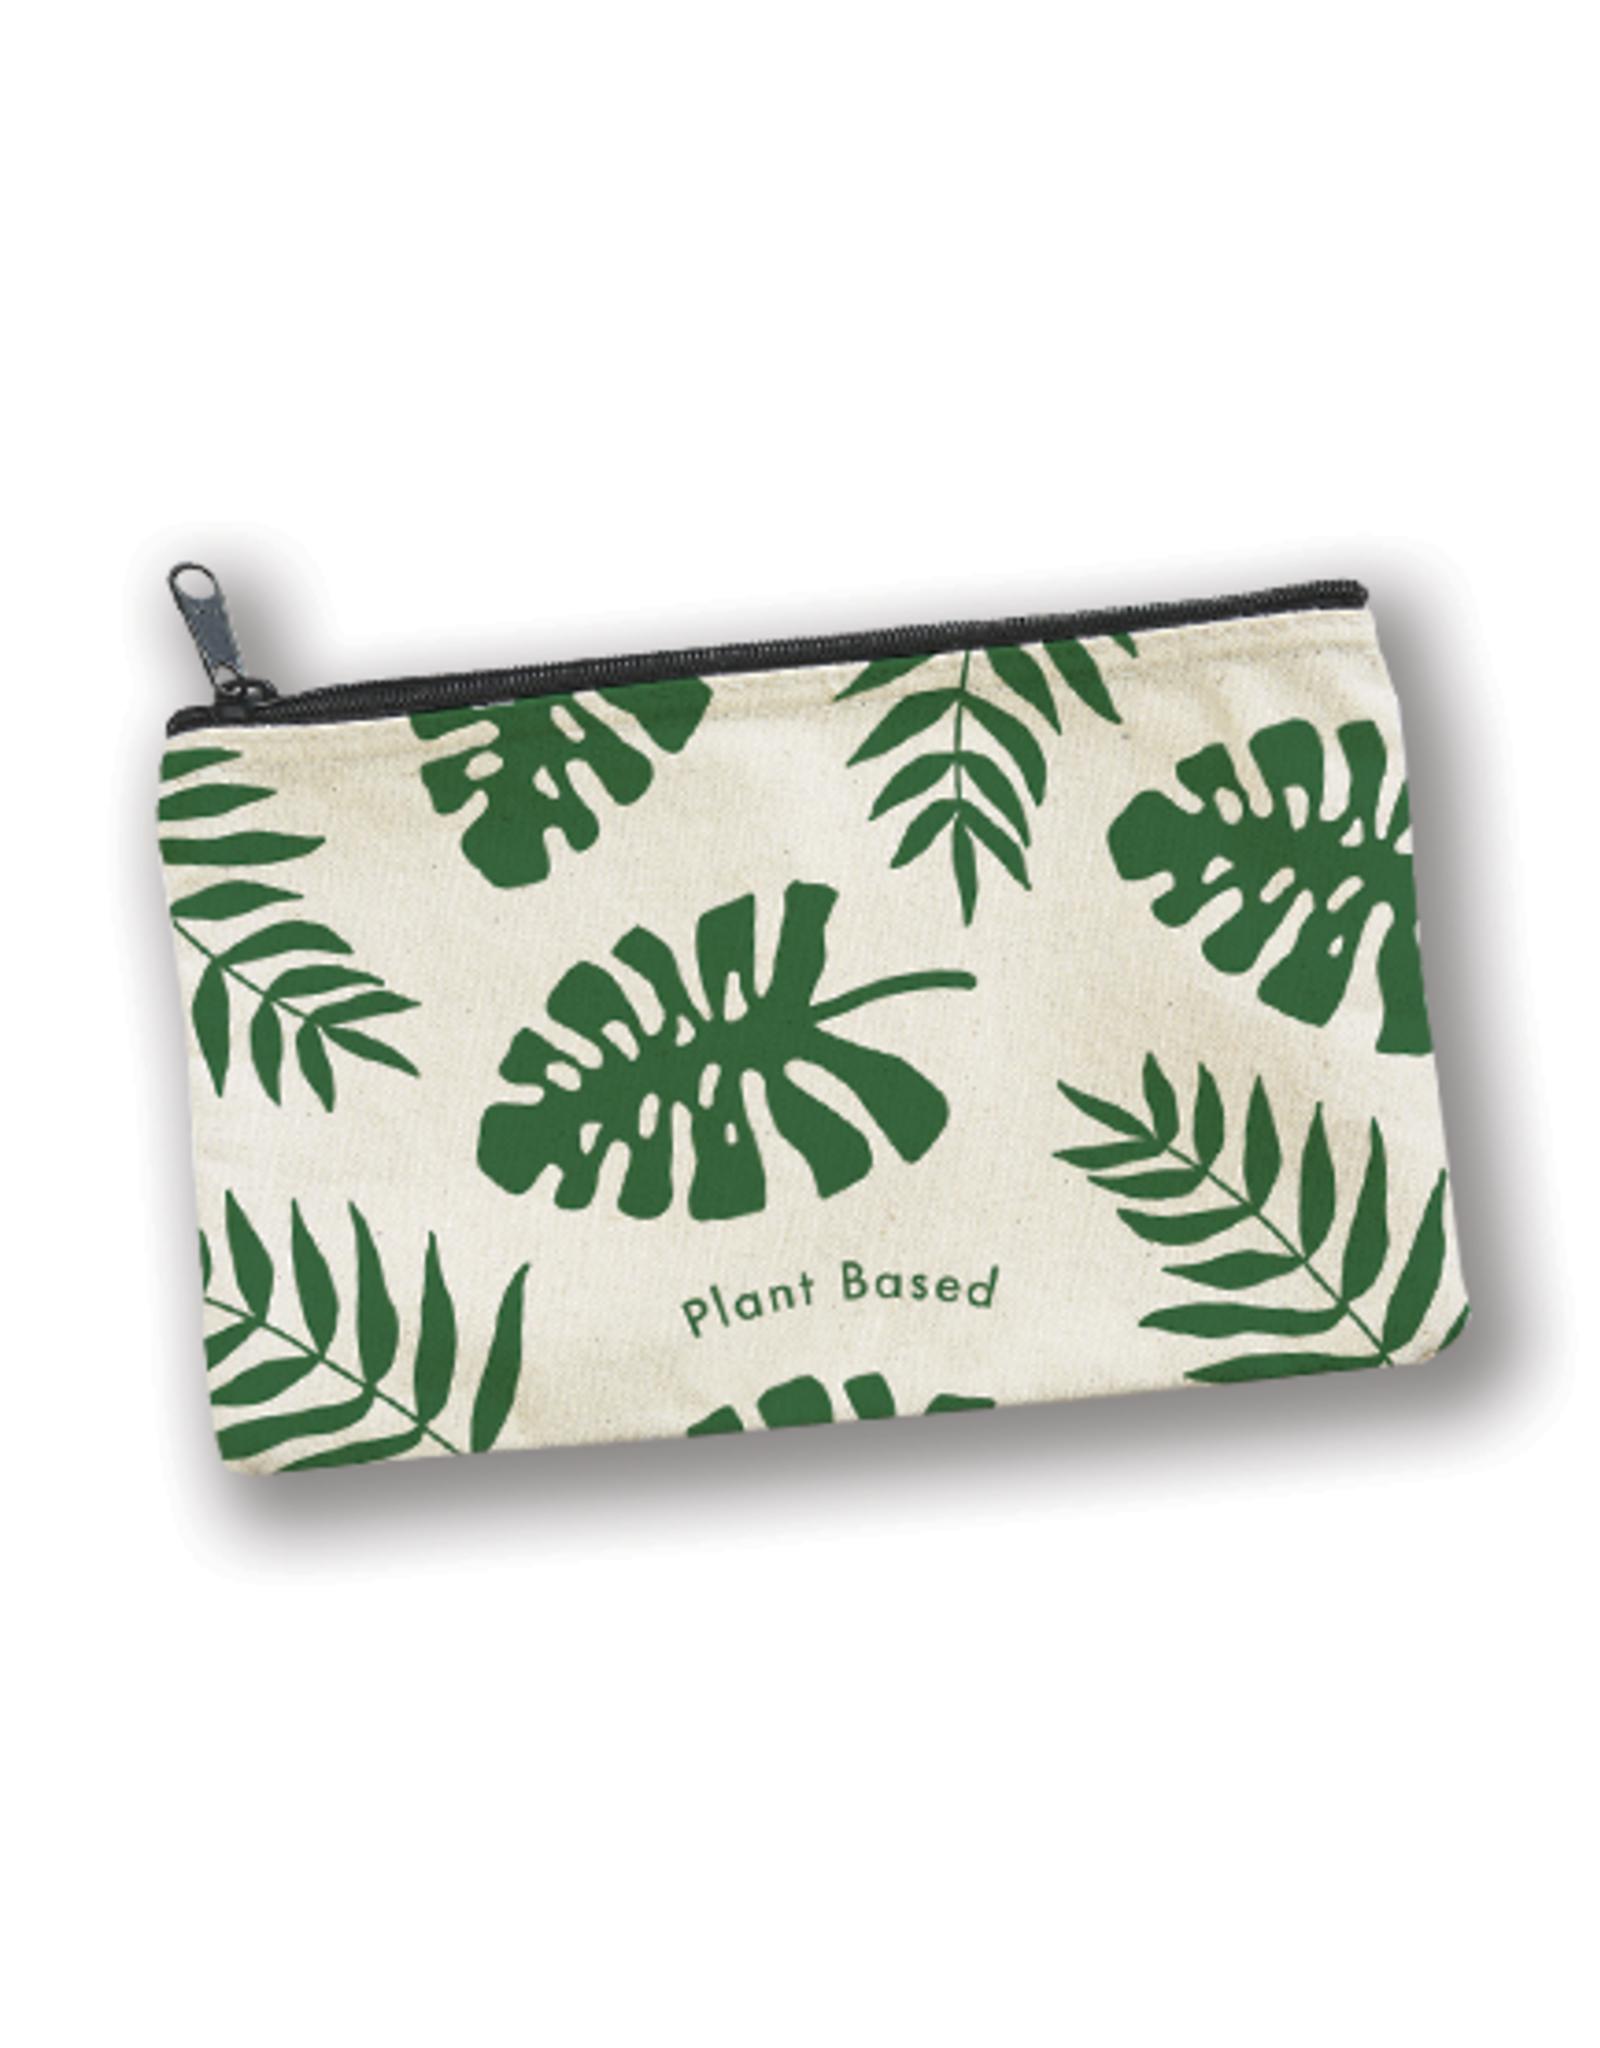 """Plant Based"" Pencil Pouch"